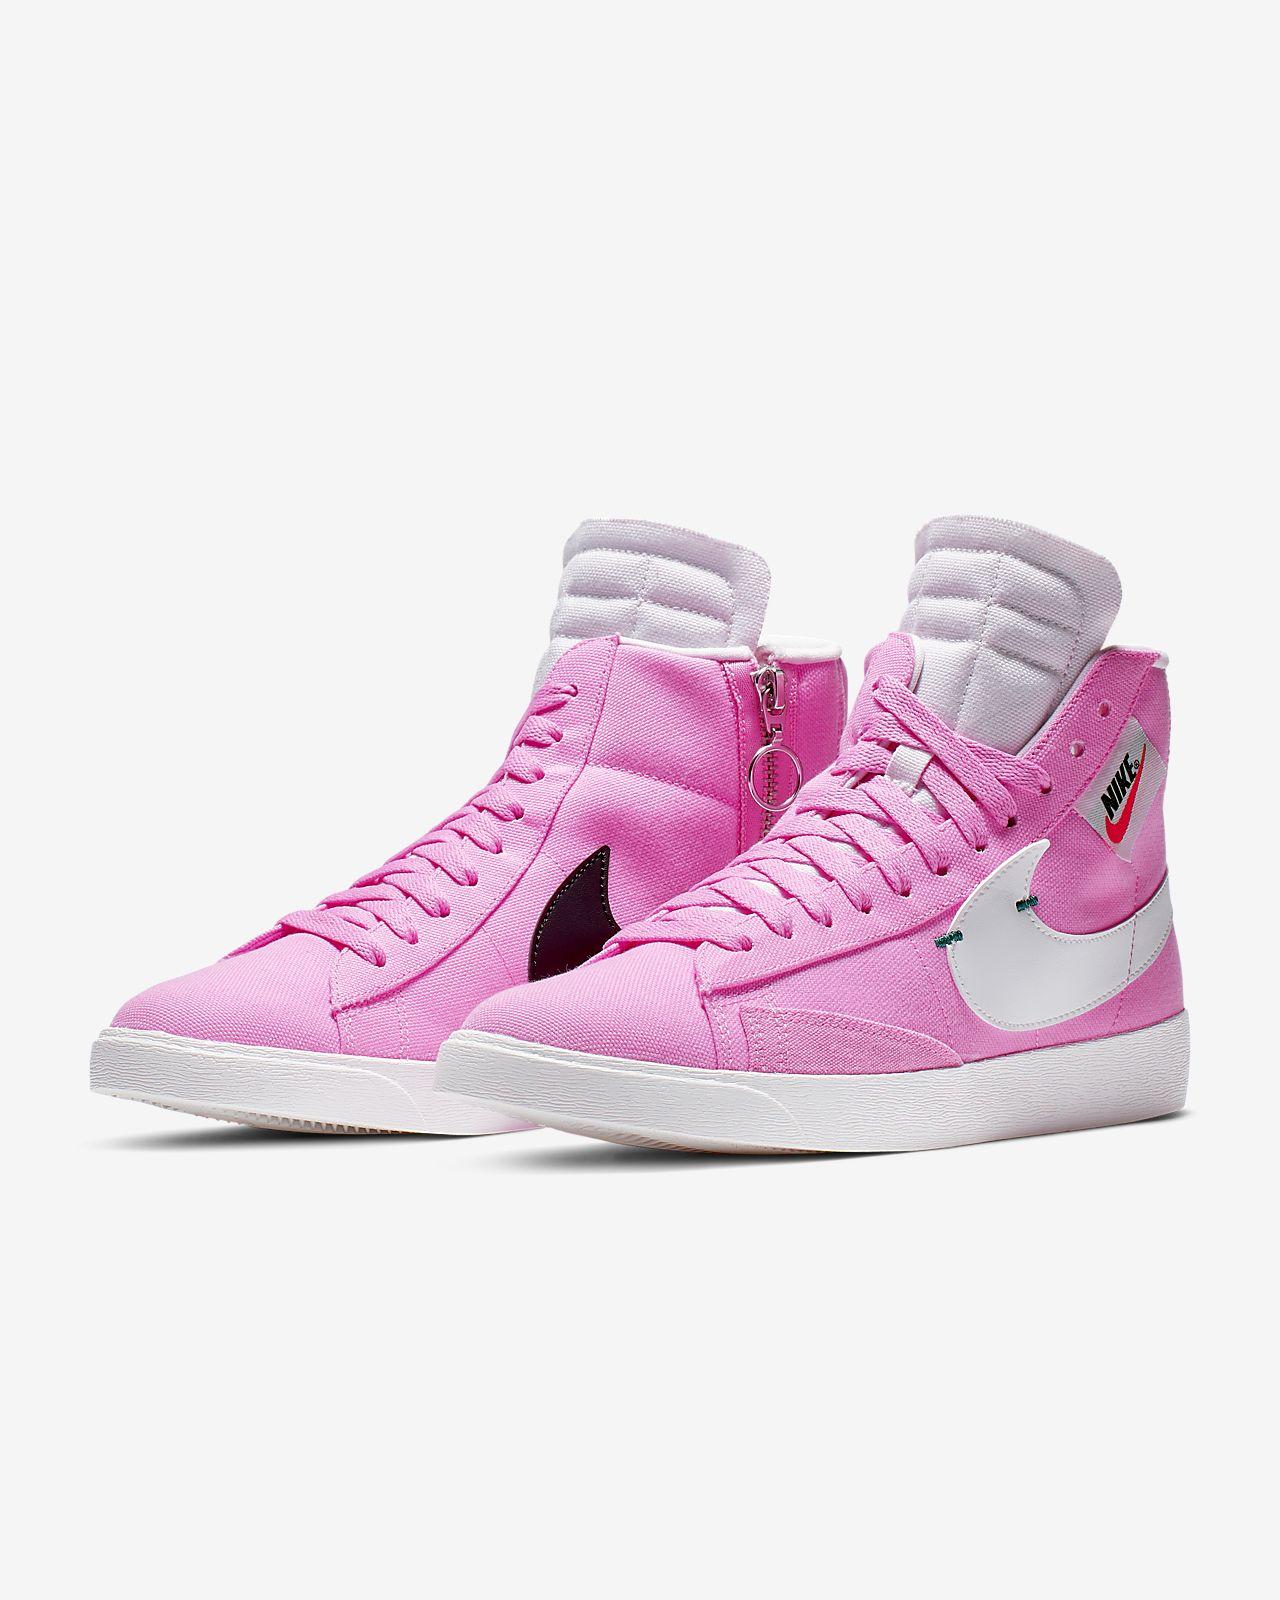 67ed0729aa234 Nike Blazer Mid Rebel Women s Shoe. Nike.com